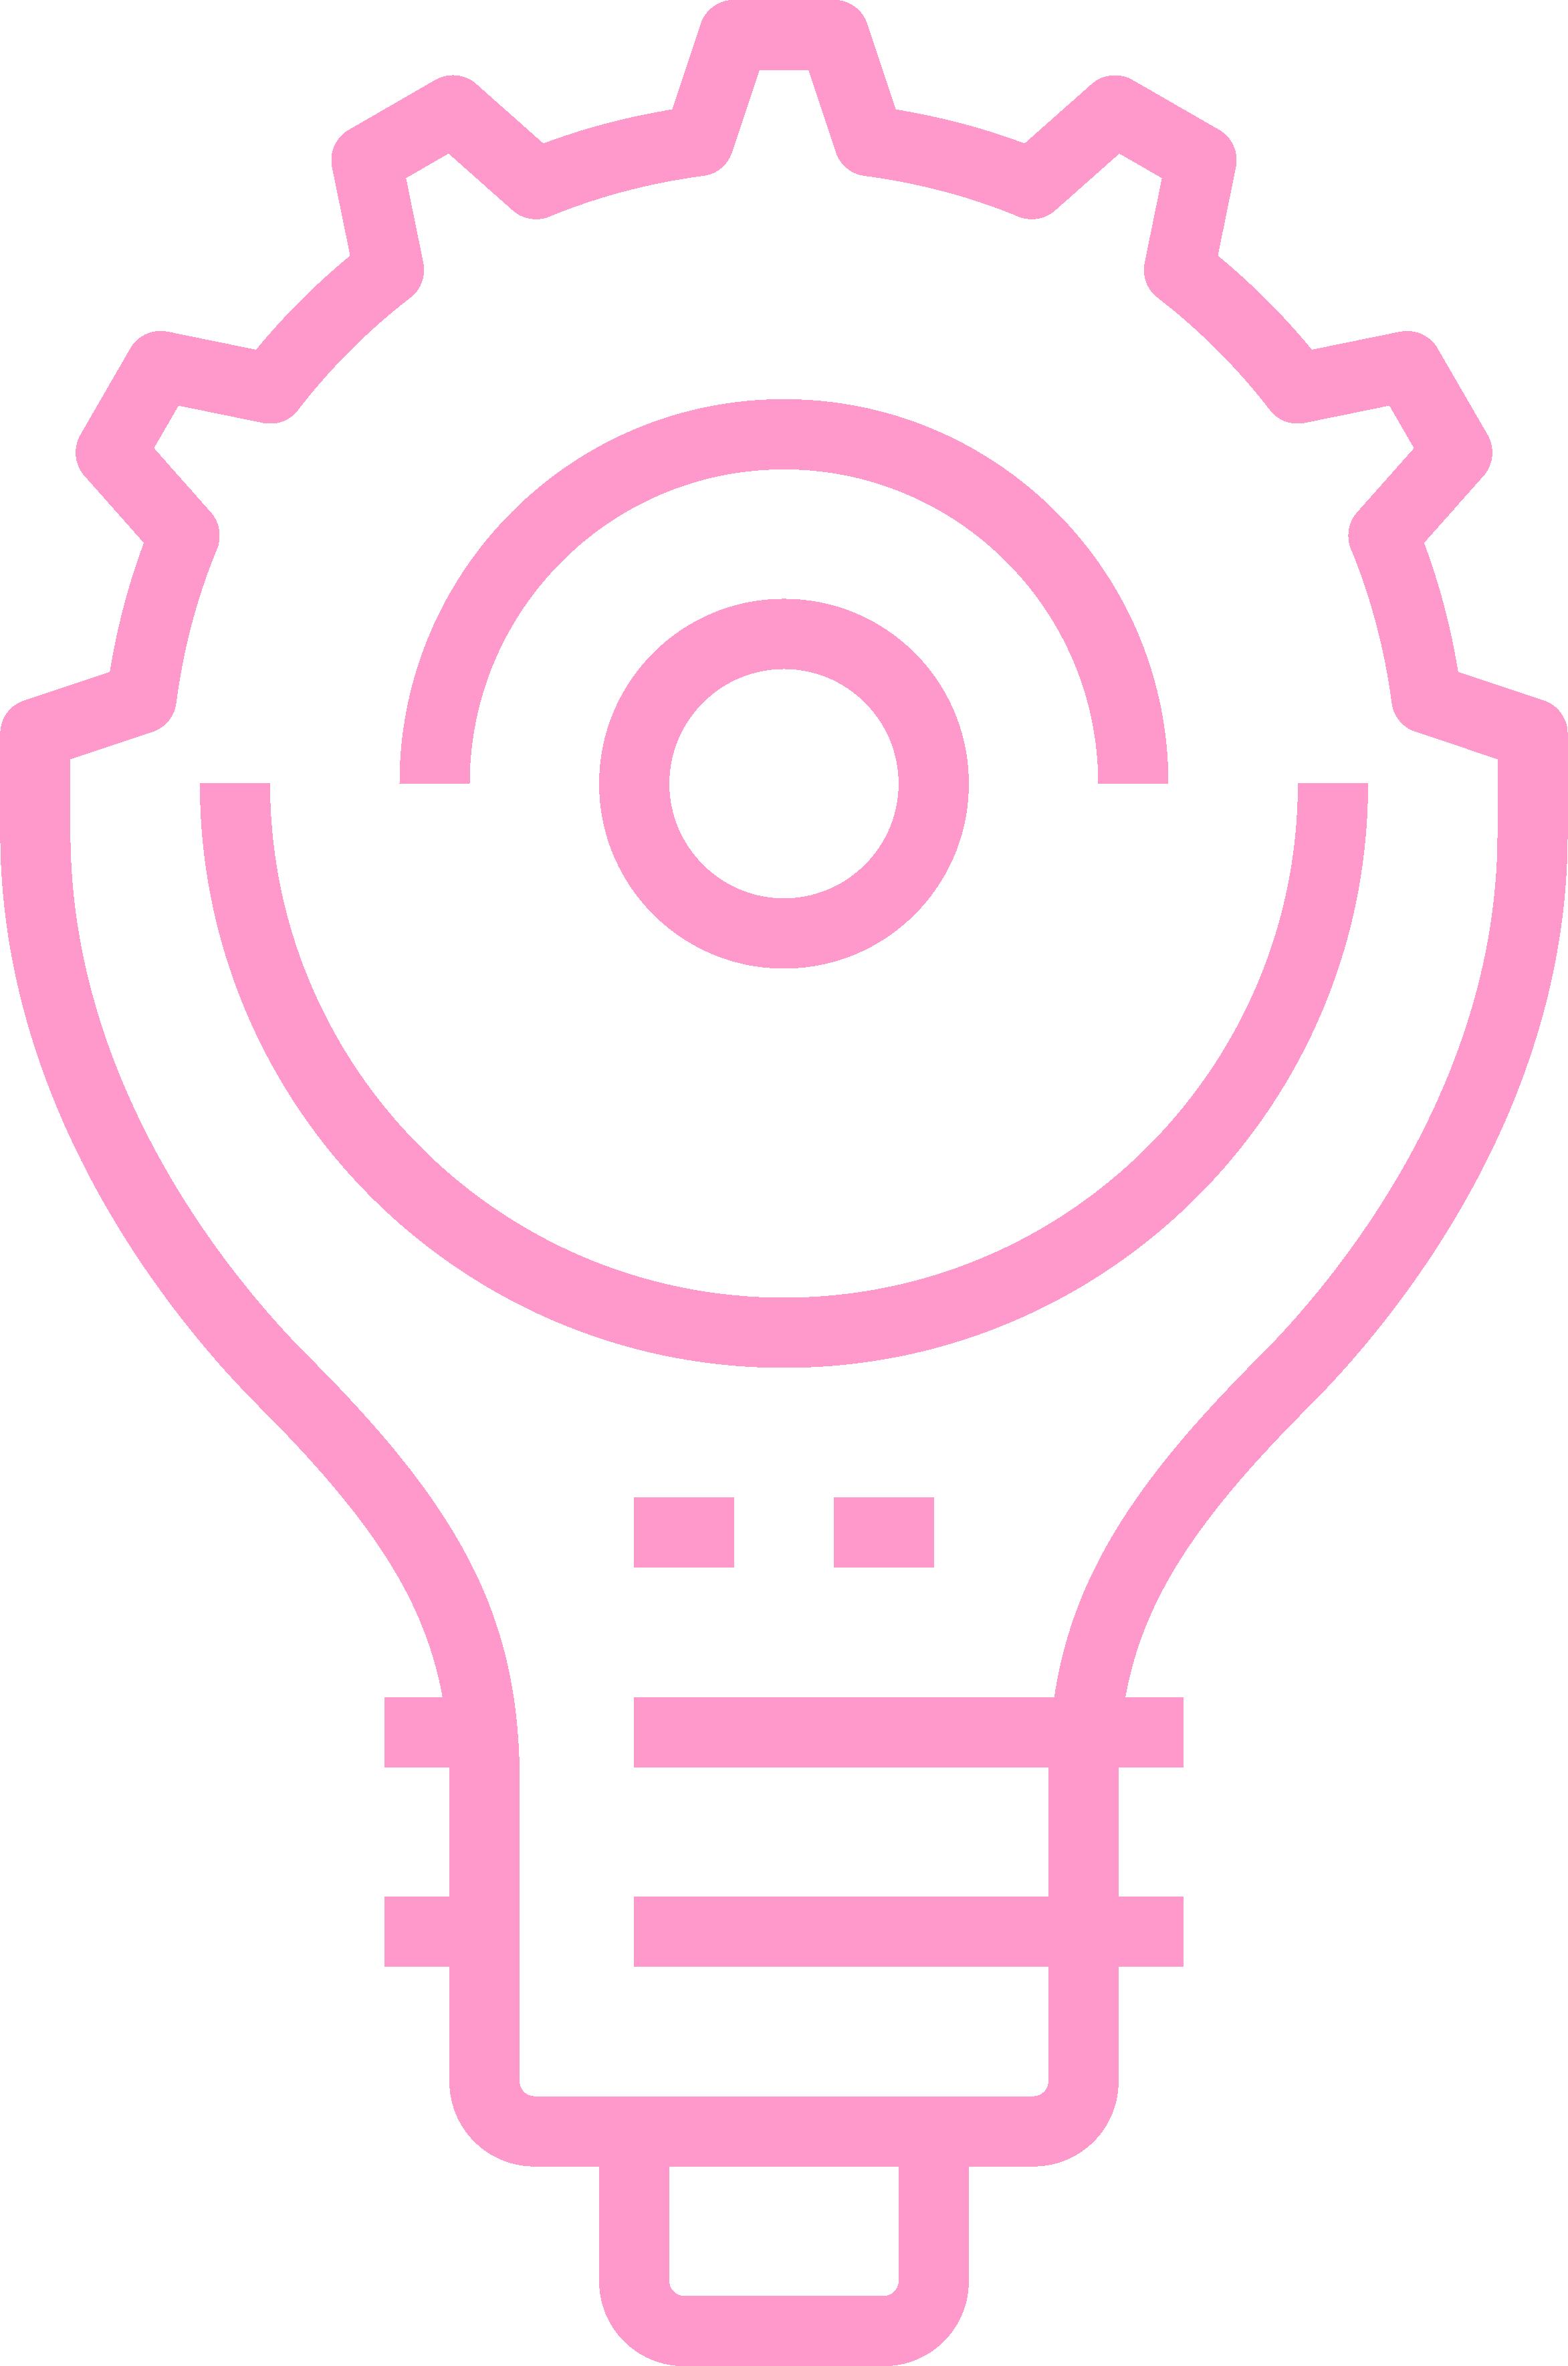 Electronics and Engineering icon